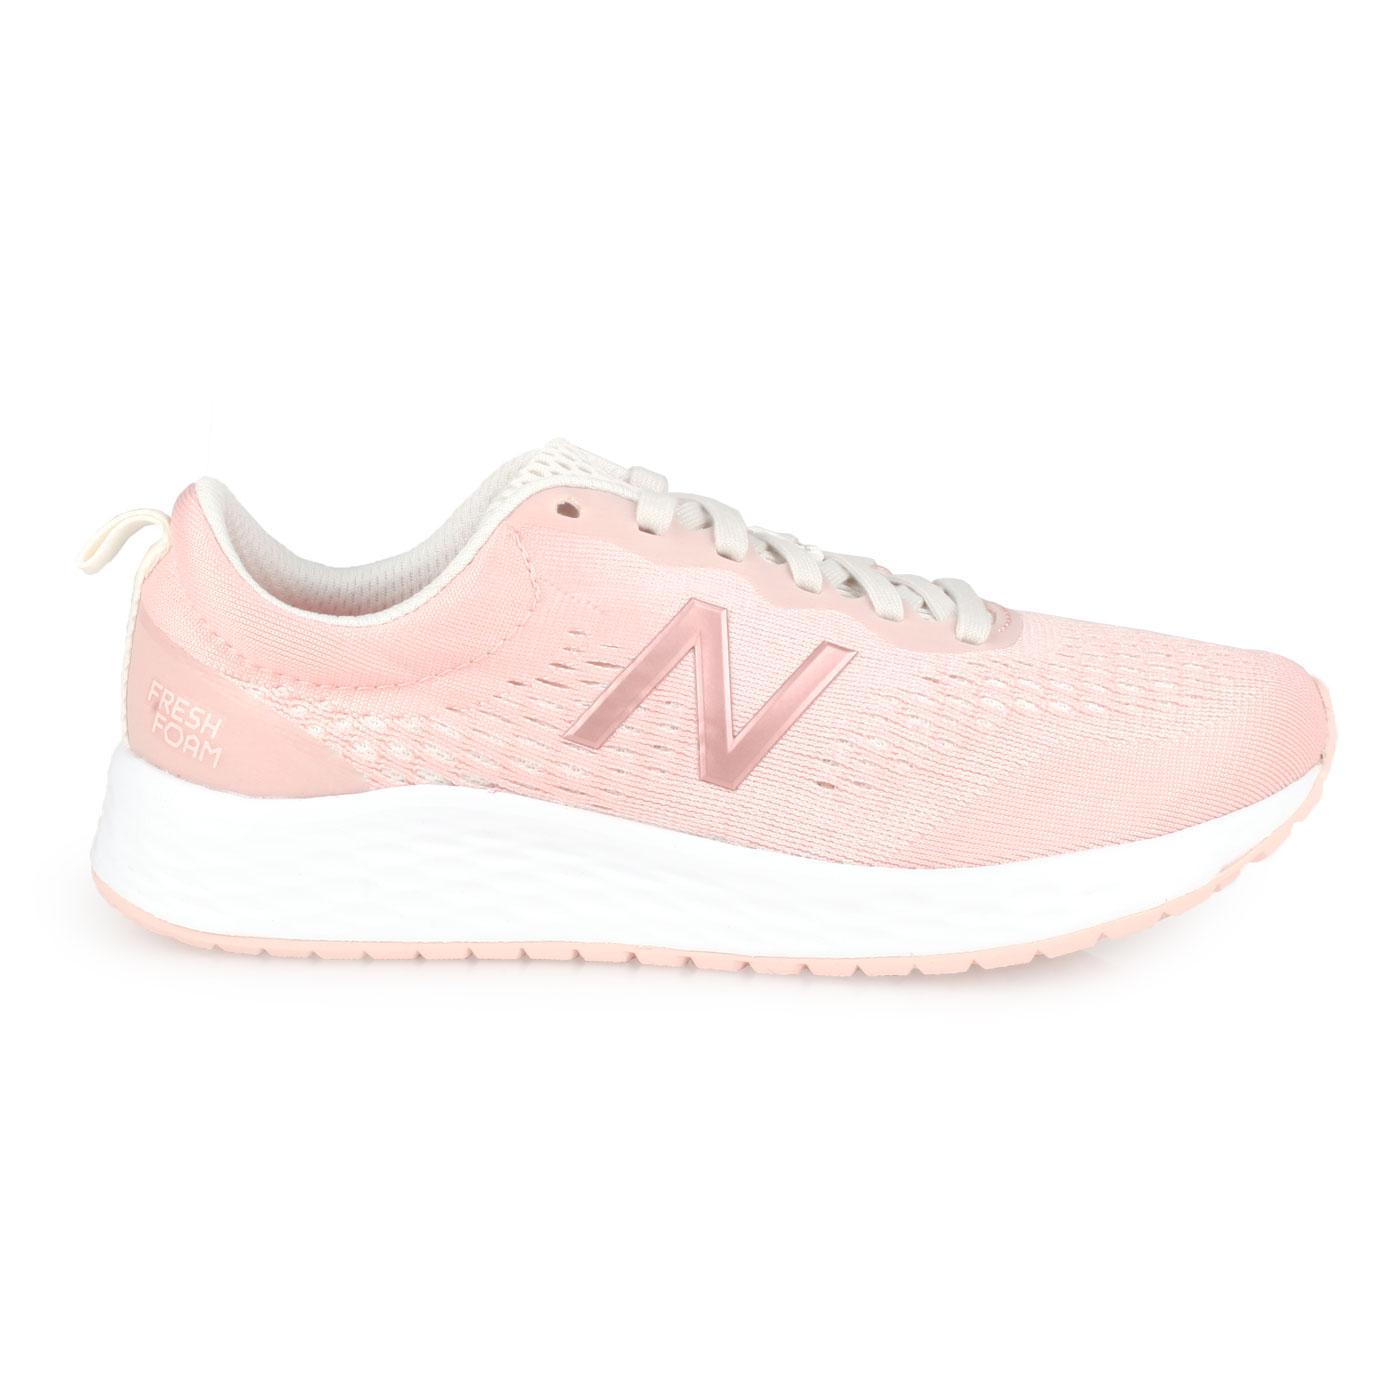 NEW BALANCE 女款慢跑鞋-WIDE WARISCP3 - 淺粉灰